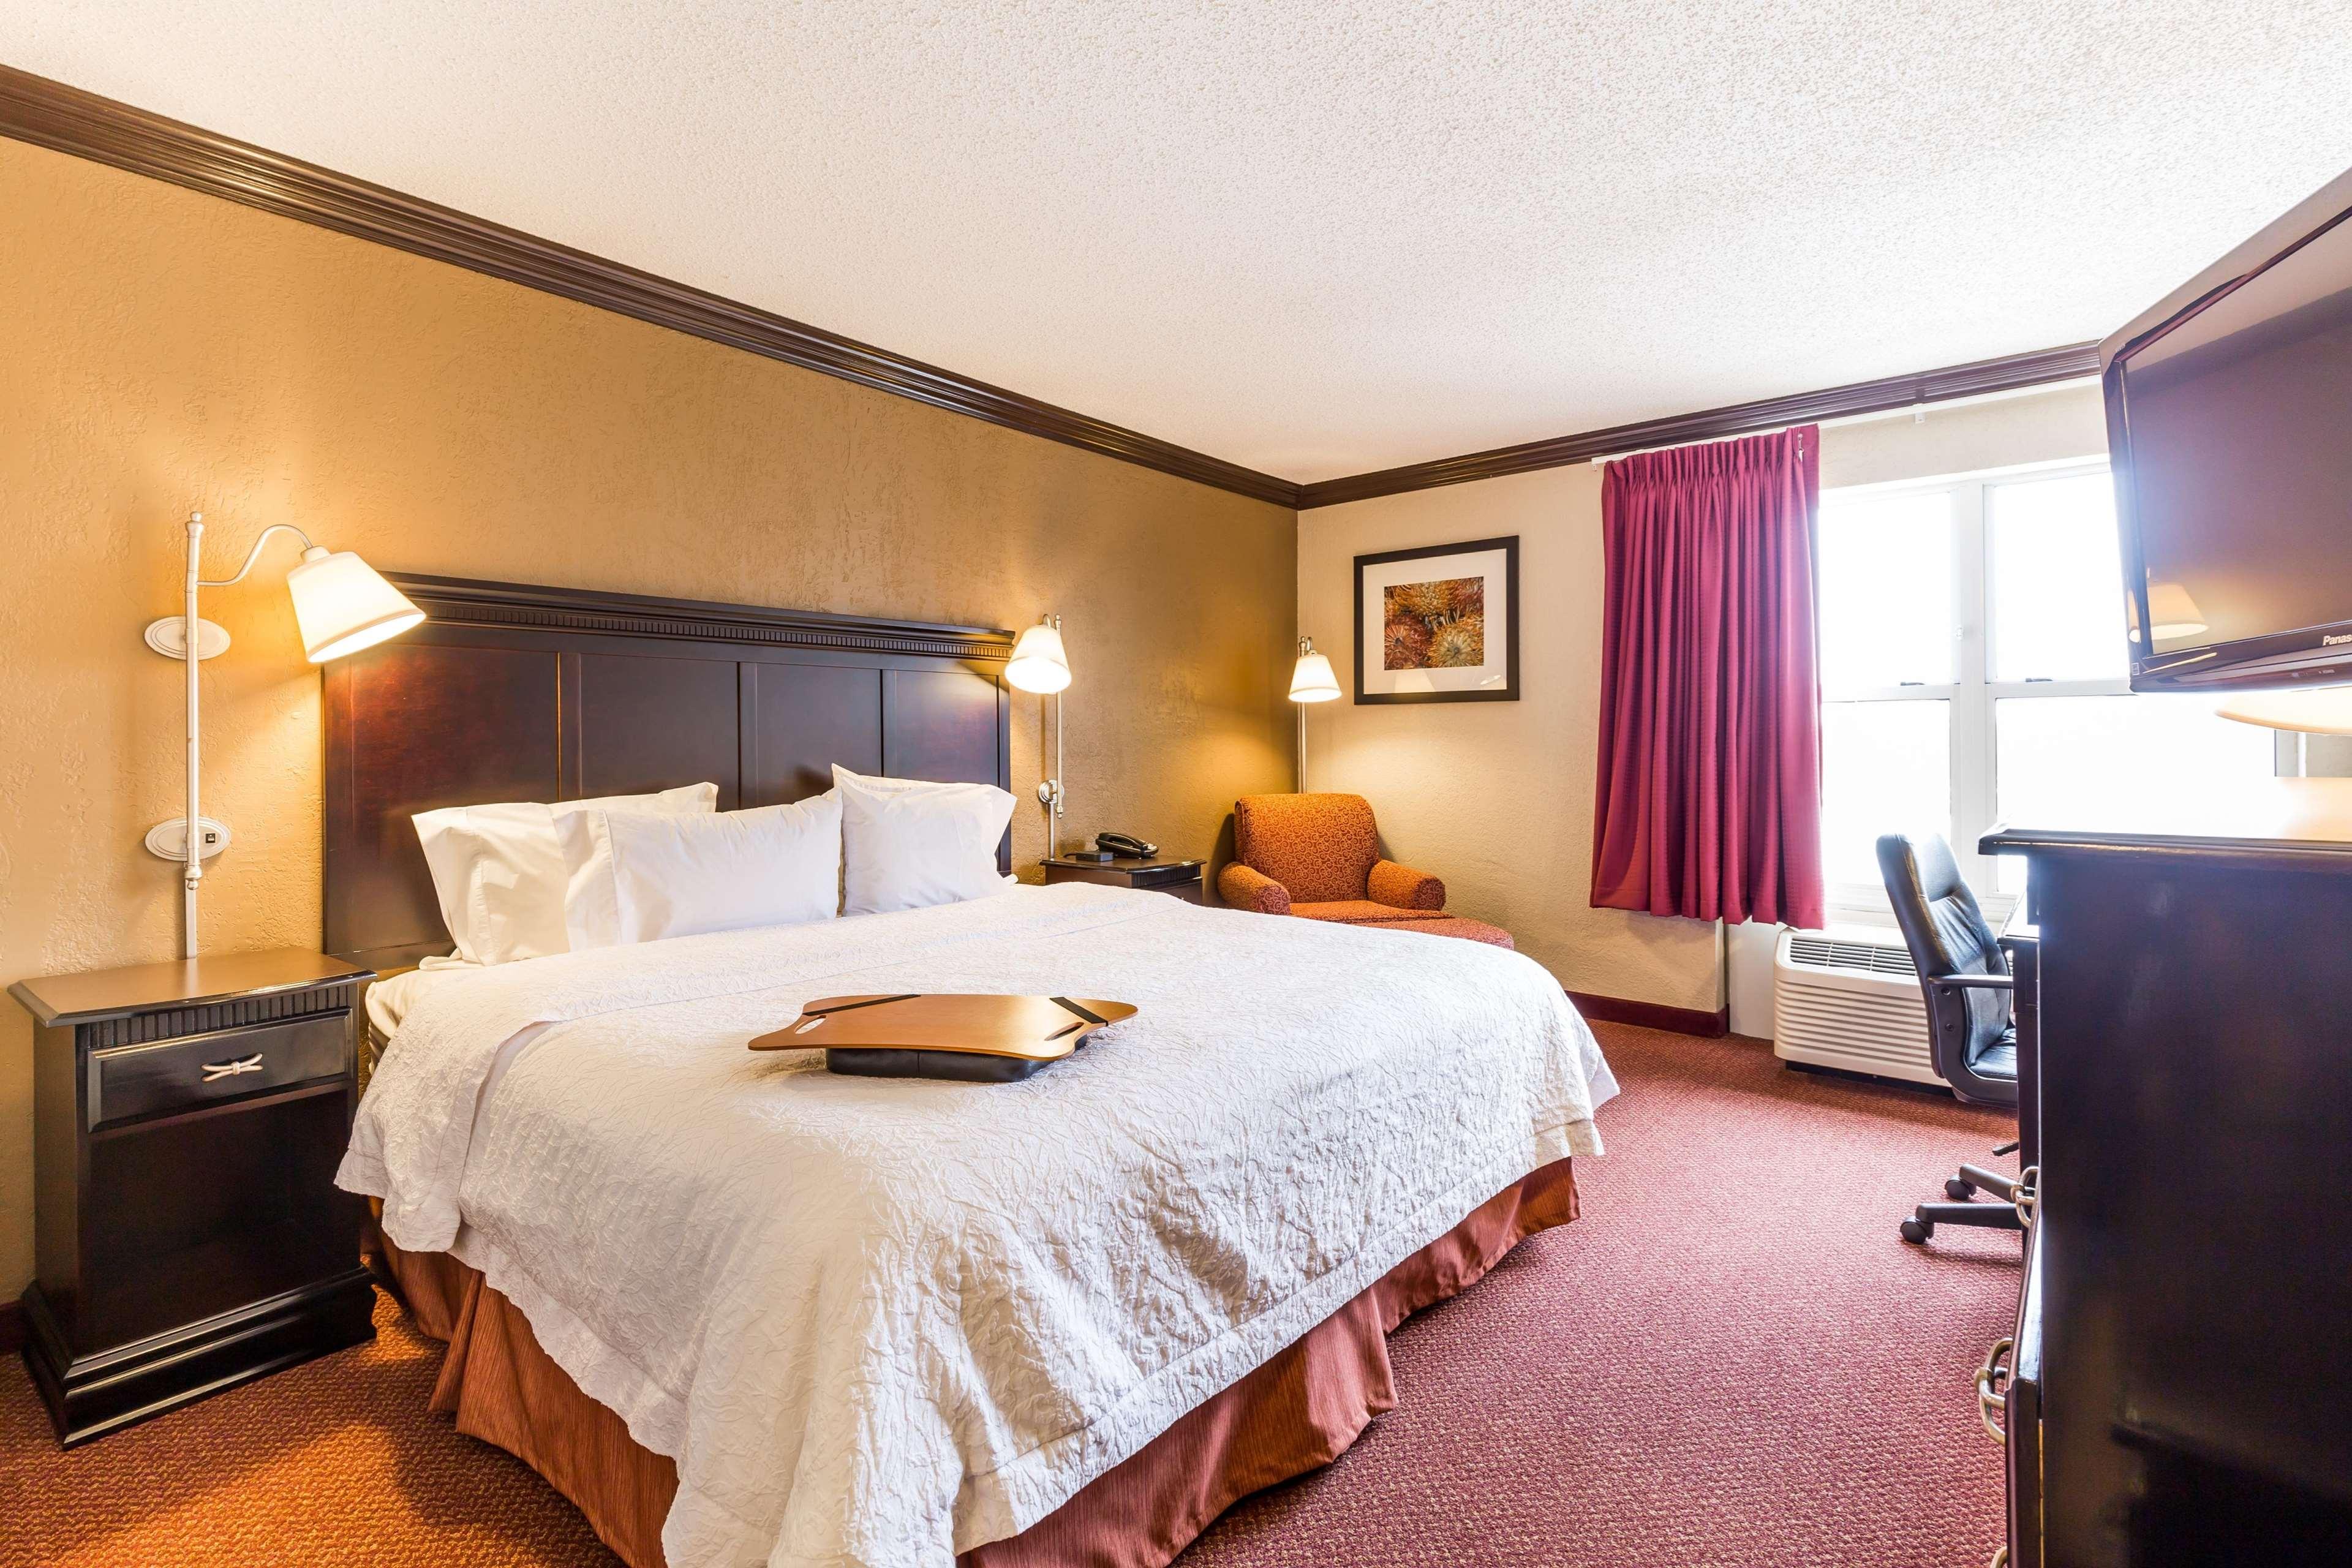 Hampton Inn & Suites Chicago/Hoffman Estates image 40